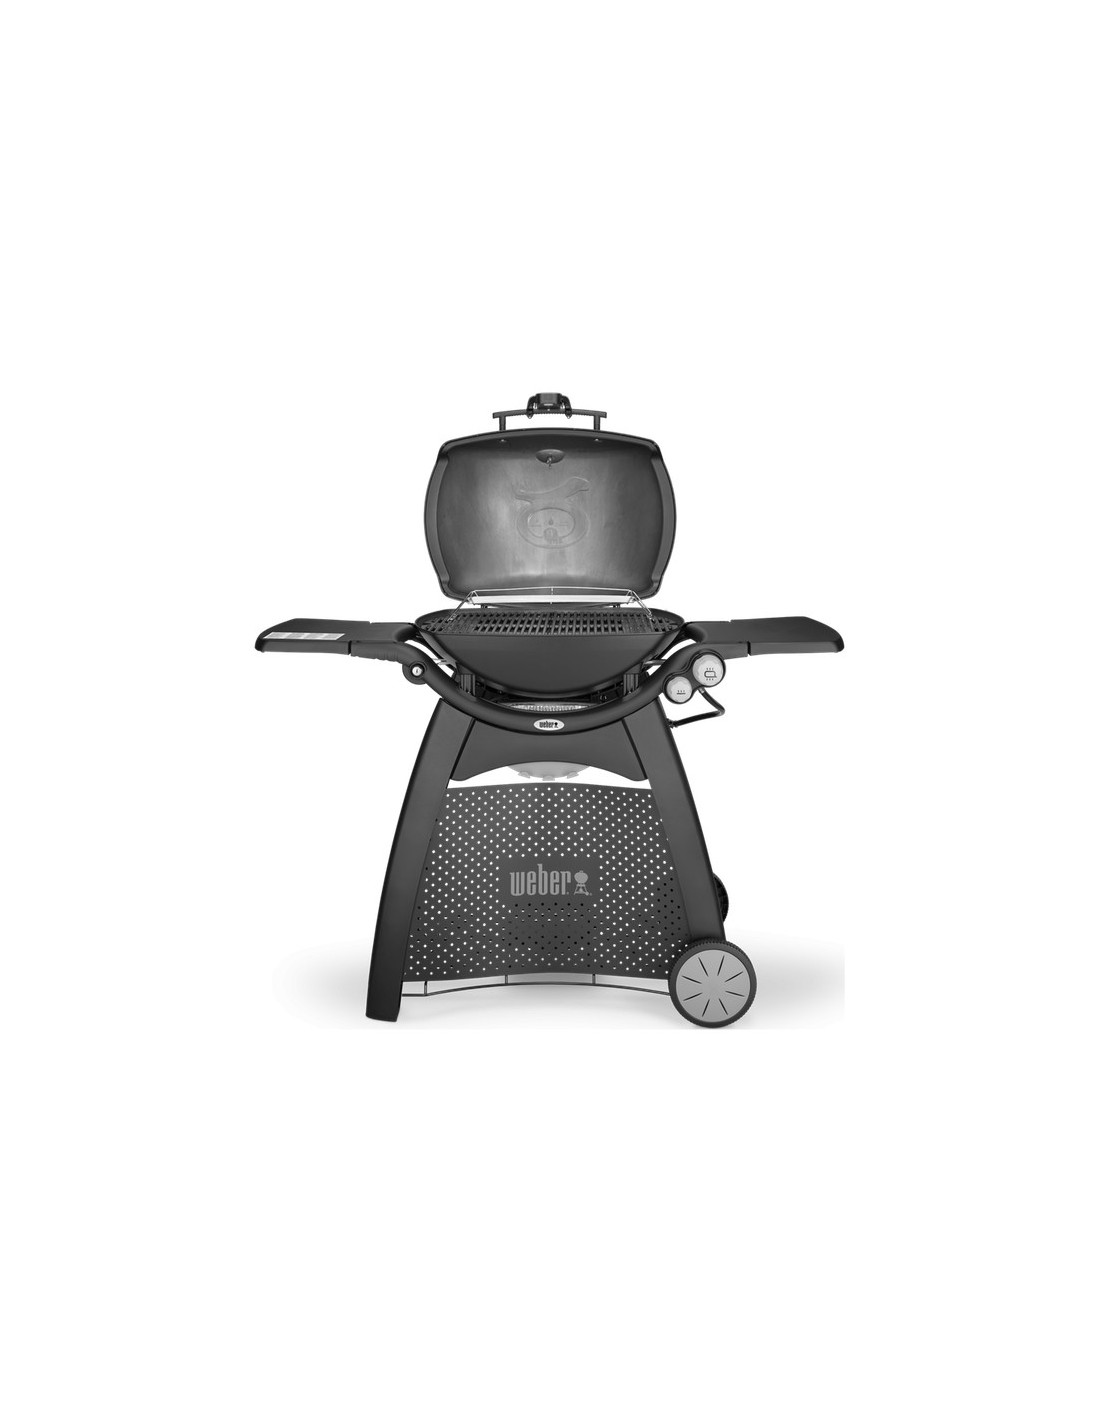 barbecue weber q3200 black